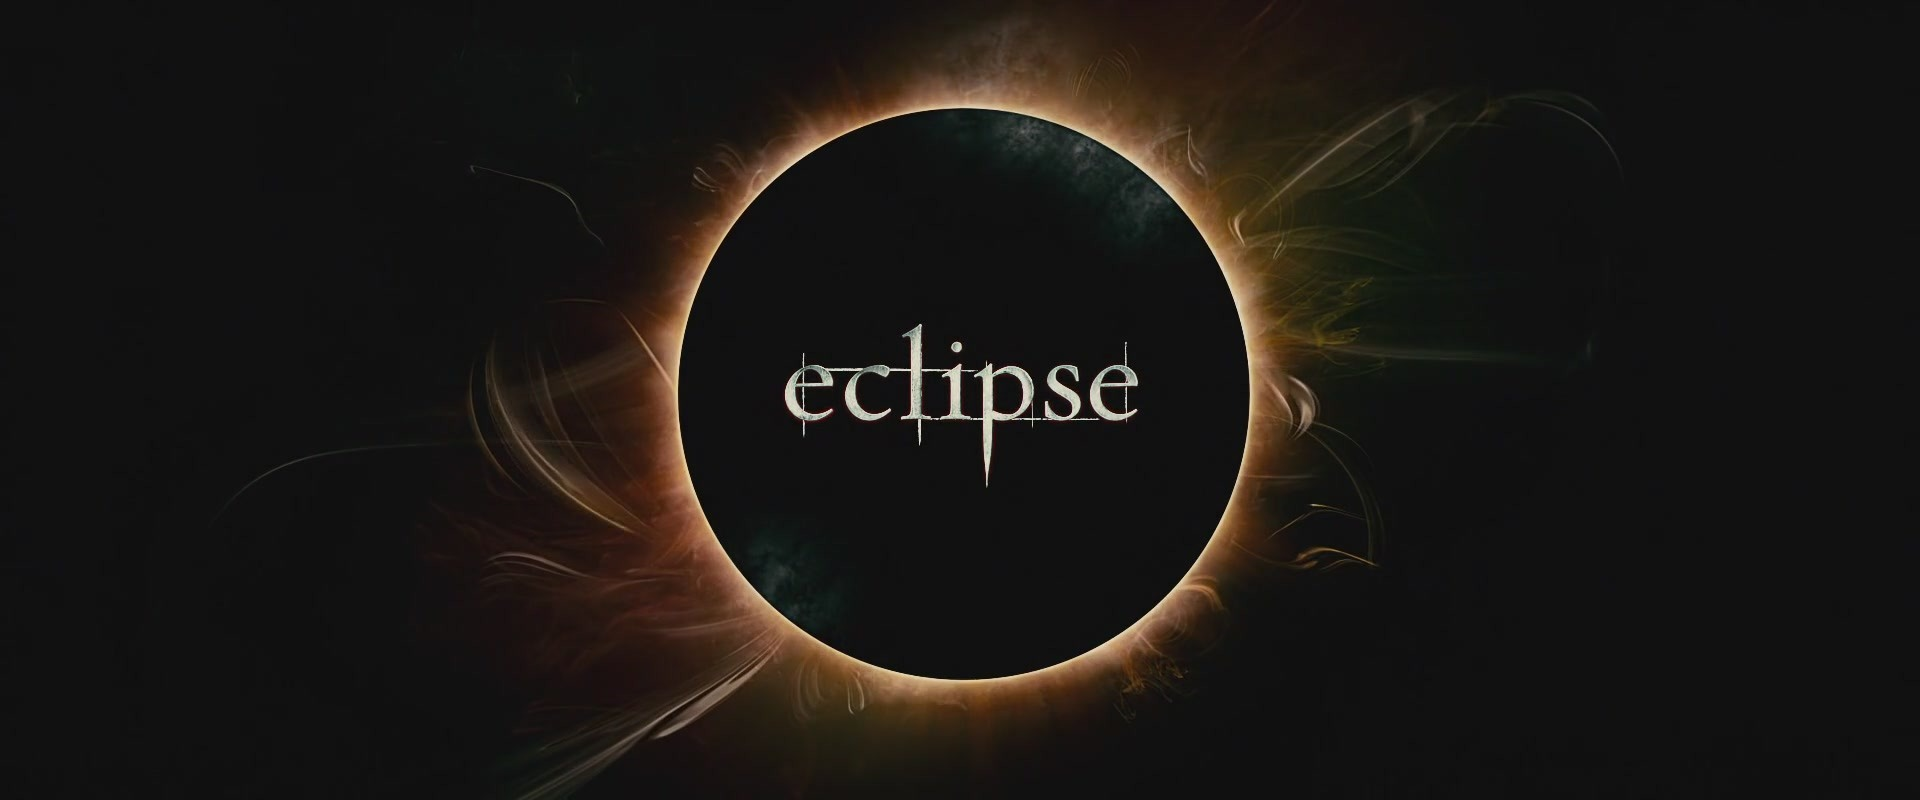 watch full movie the twilight saga eclipse 2010 online